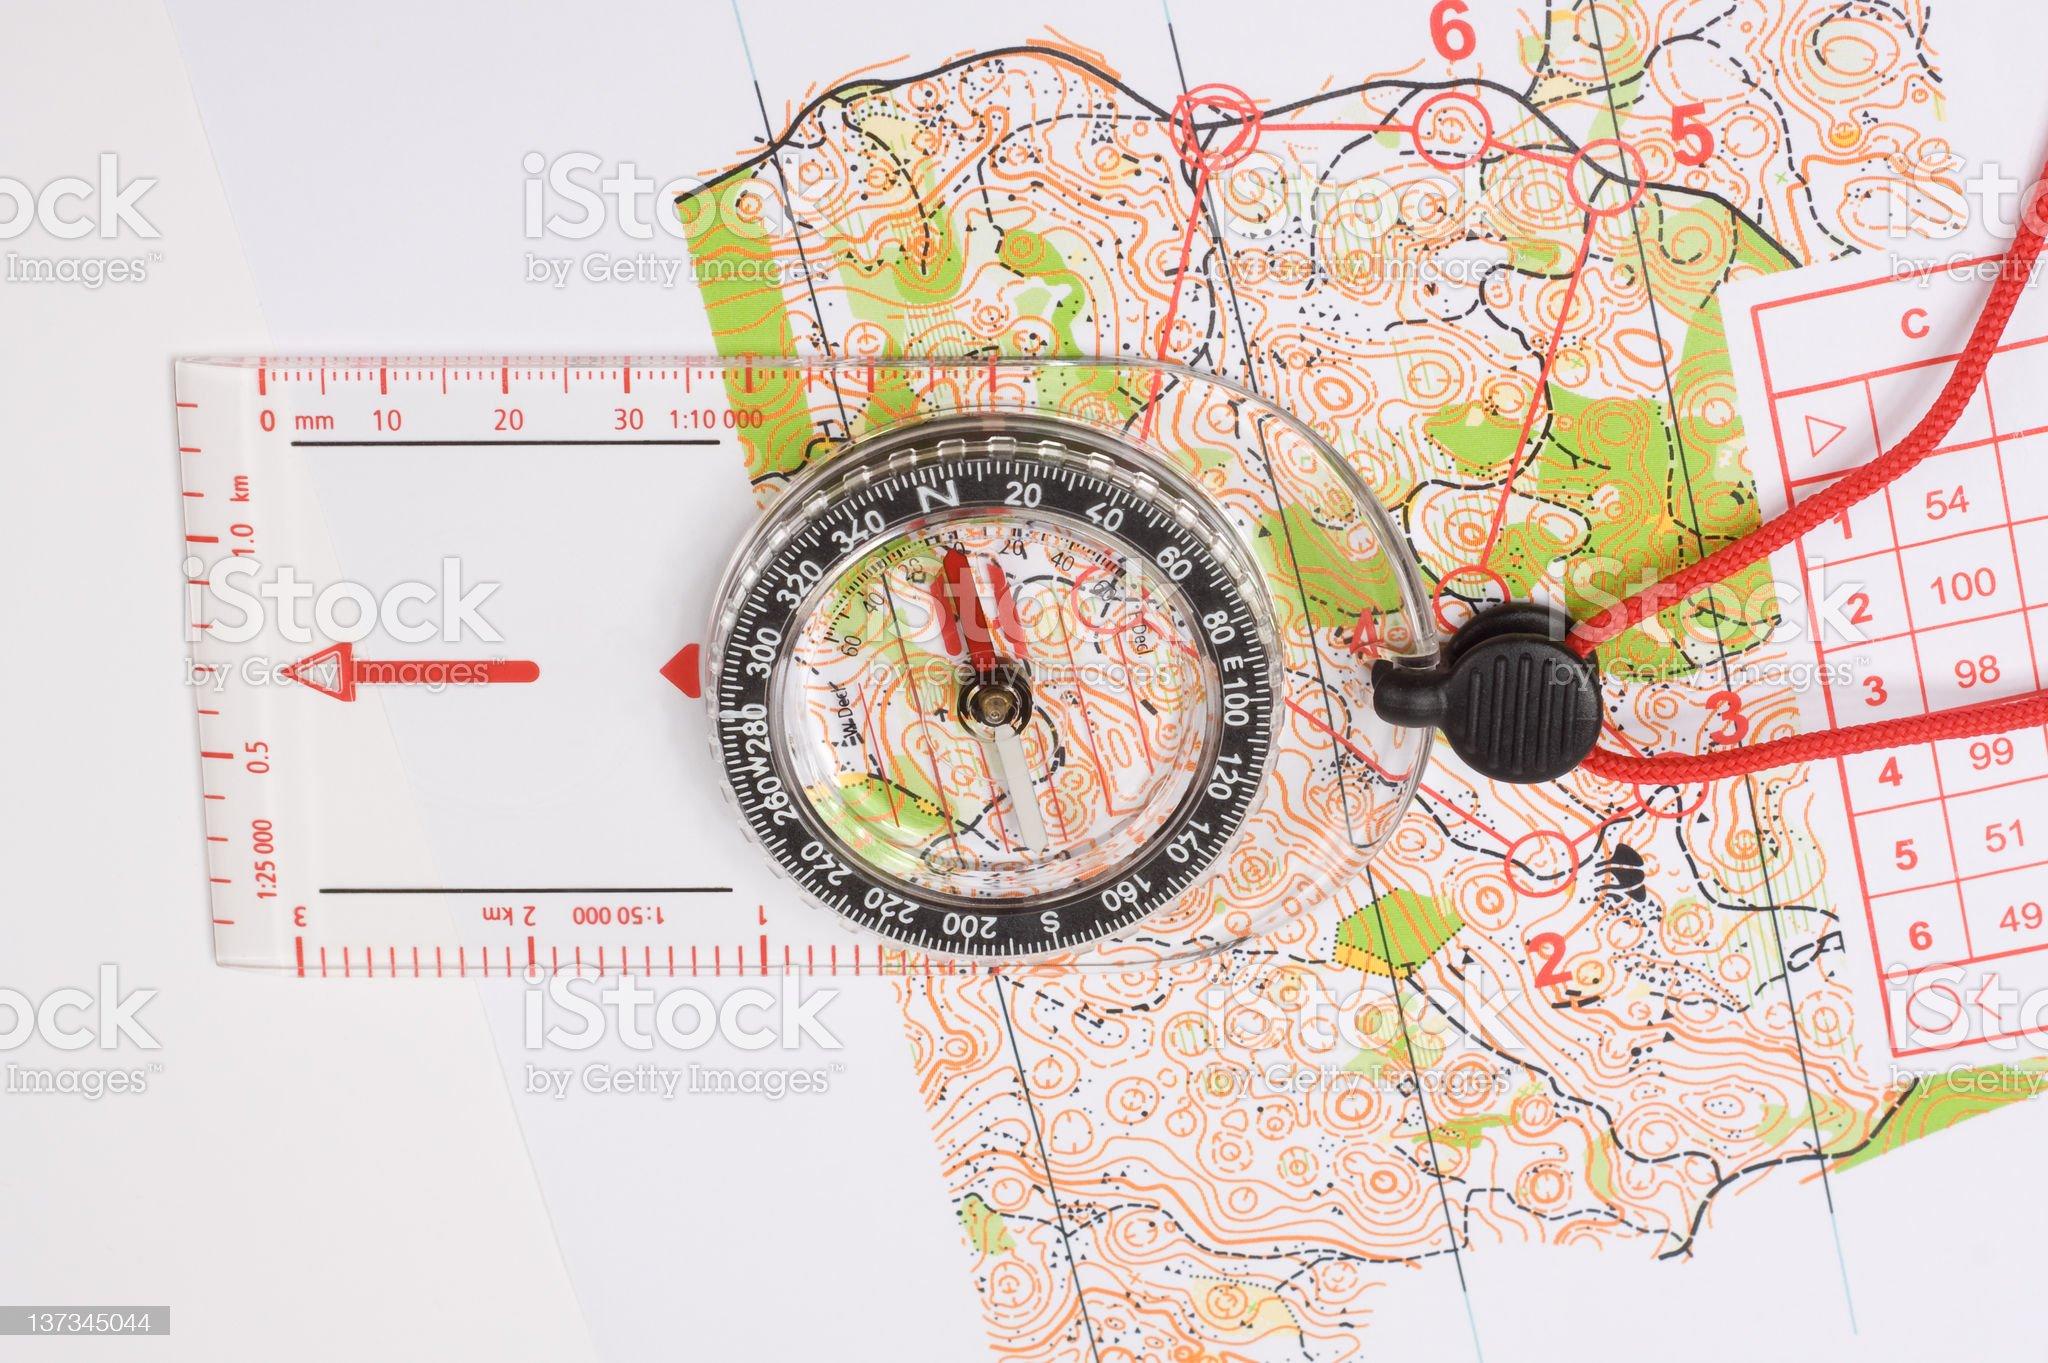 Foot Orienteering royalty-free stock photo